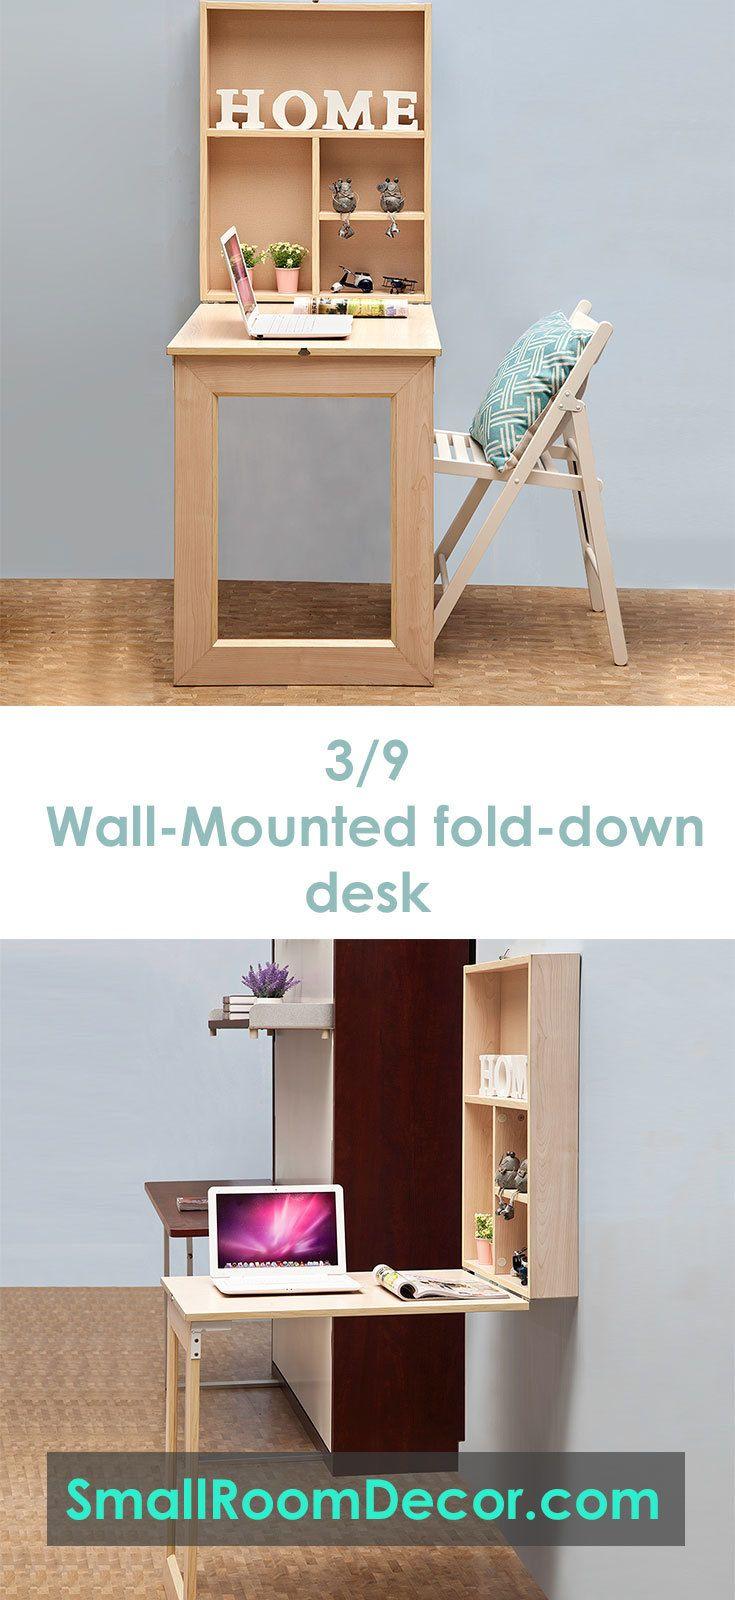 Top 9 Small Bedroom Storage Ideas | Small Bedroom Ideas | Small ...